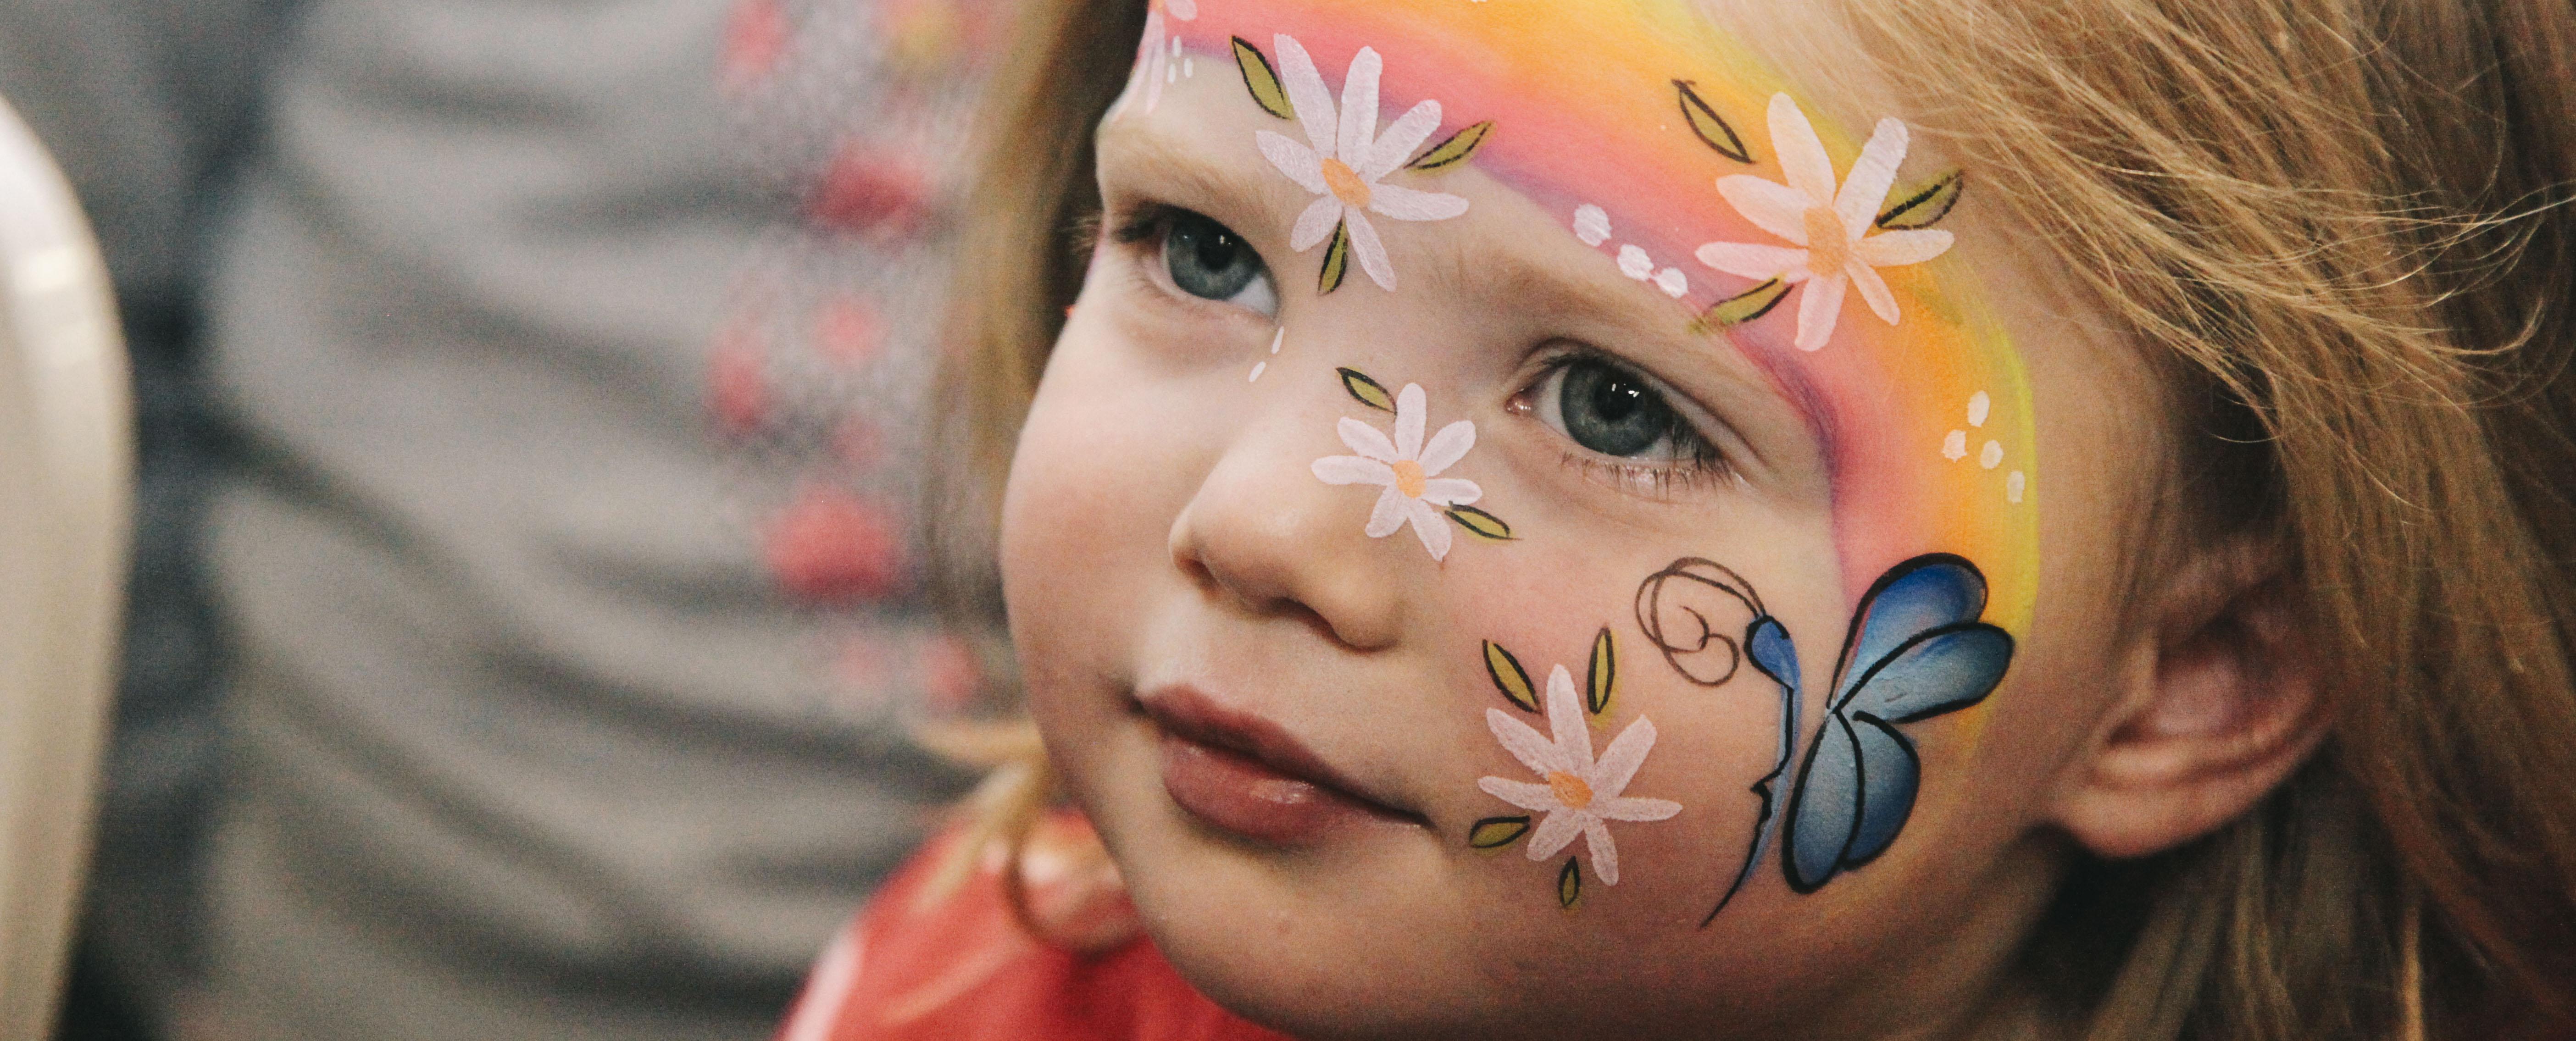 Child Portrait Photography. Portrait Photography Adelaide.